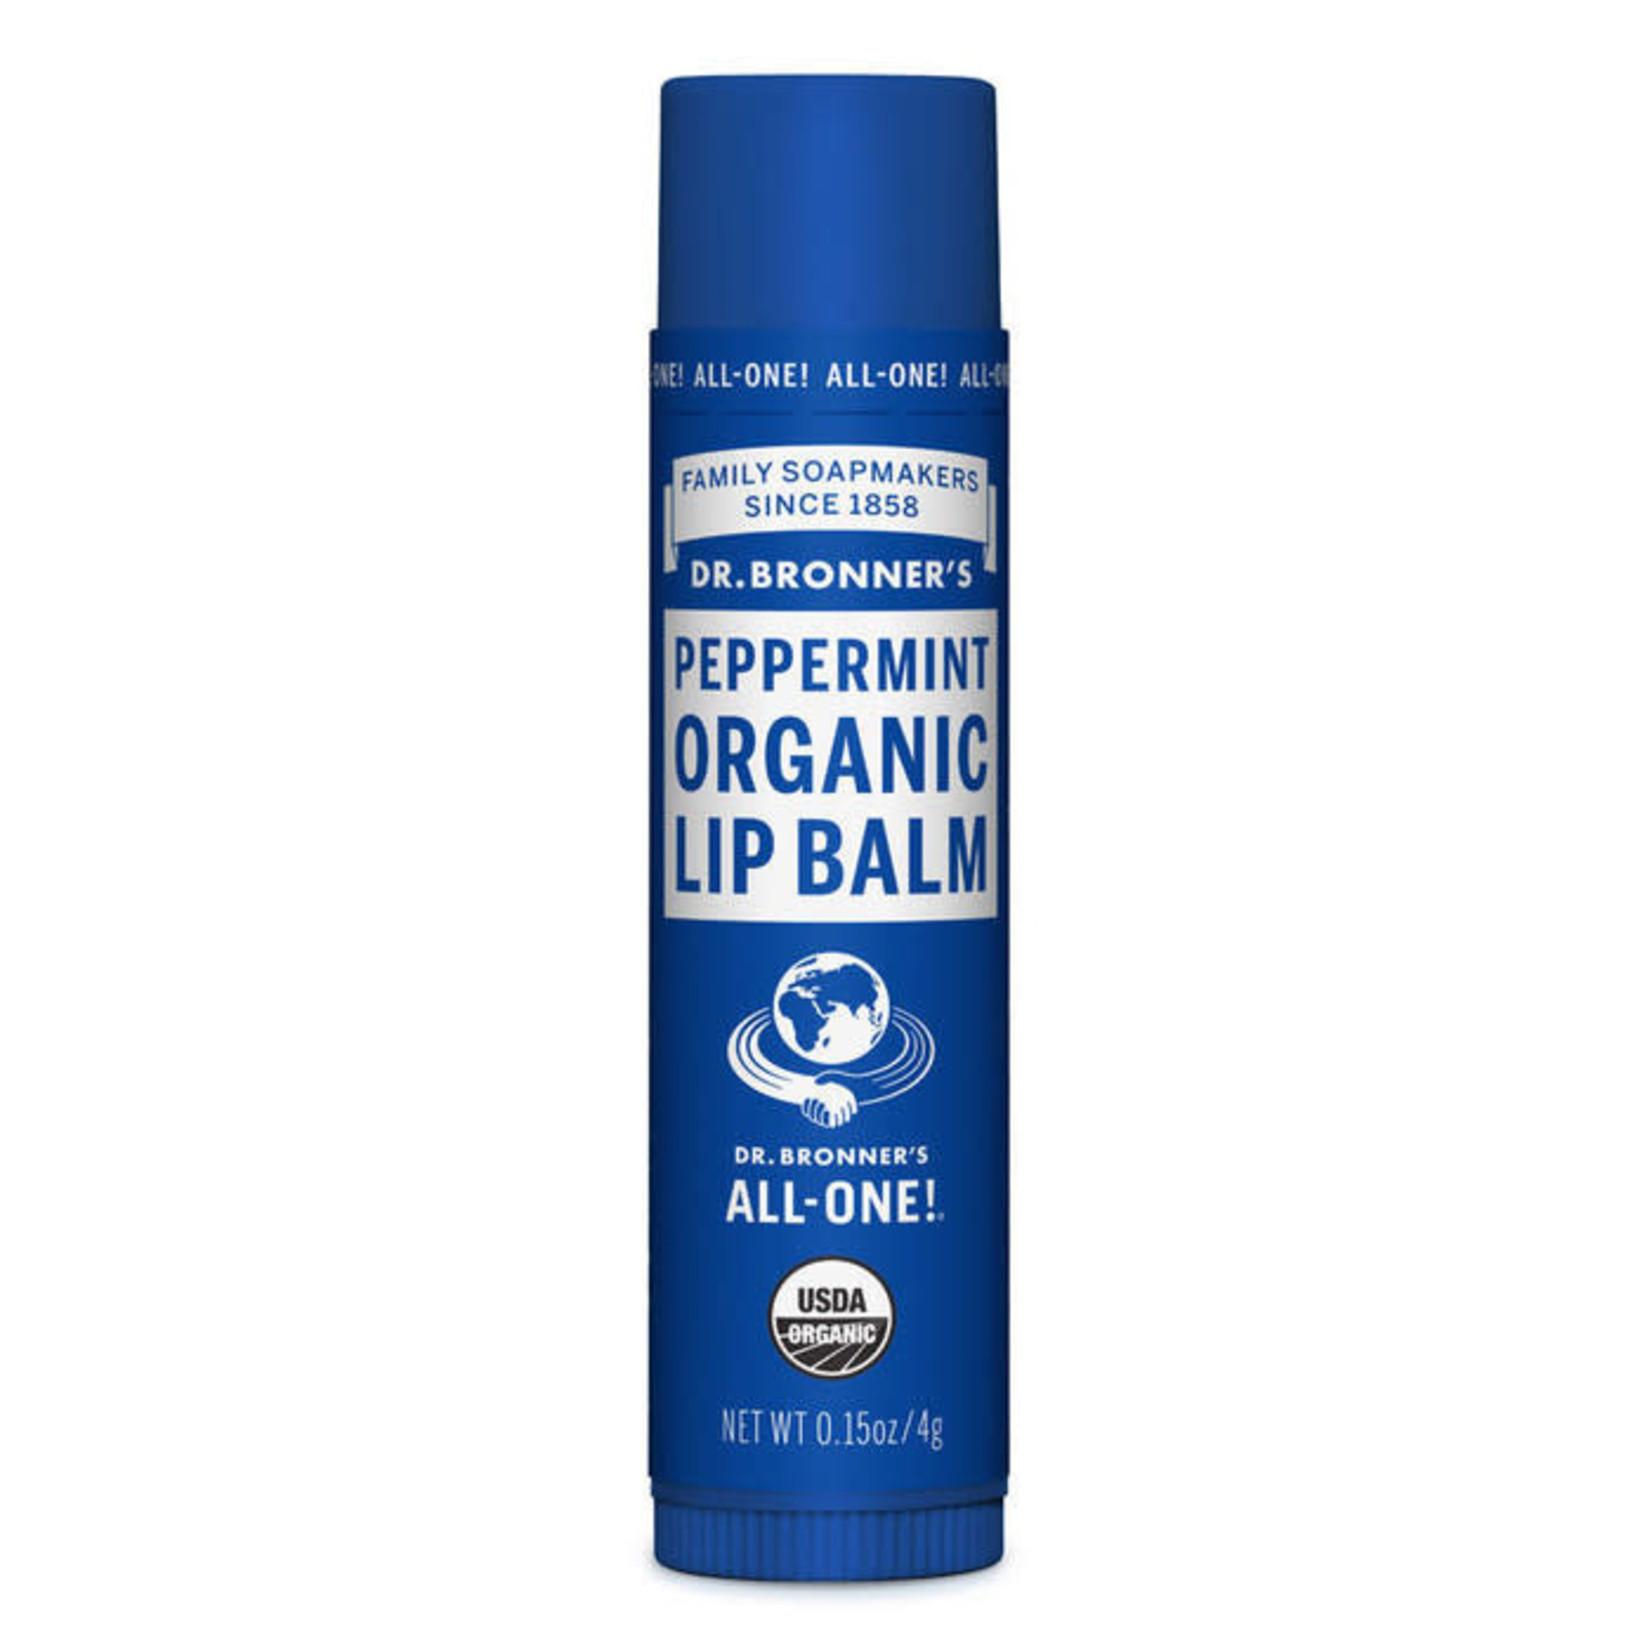 Dr. Bronner's Dr. Bronner's Organic Lip Balm